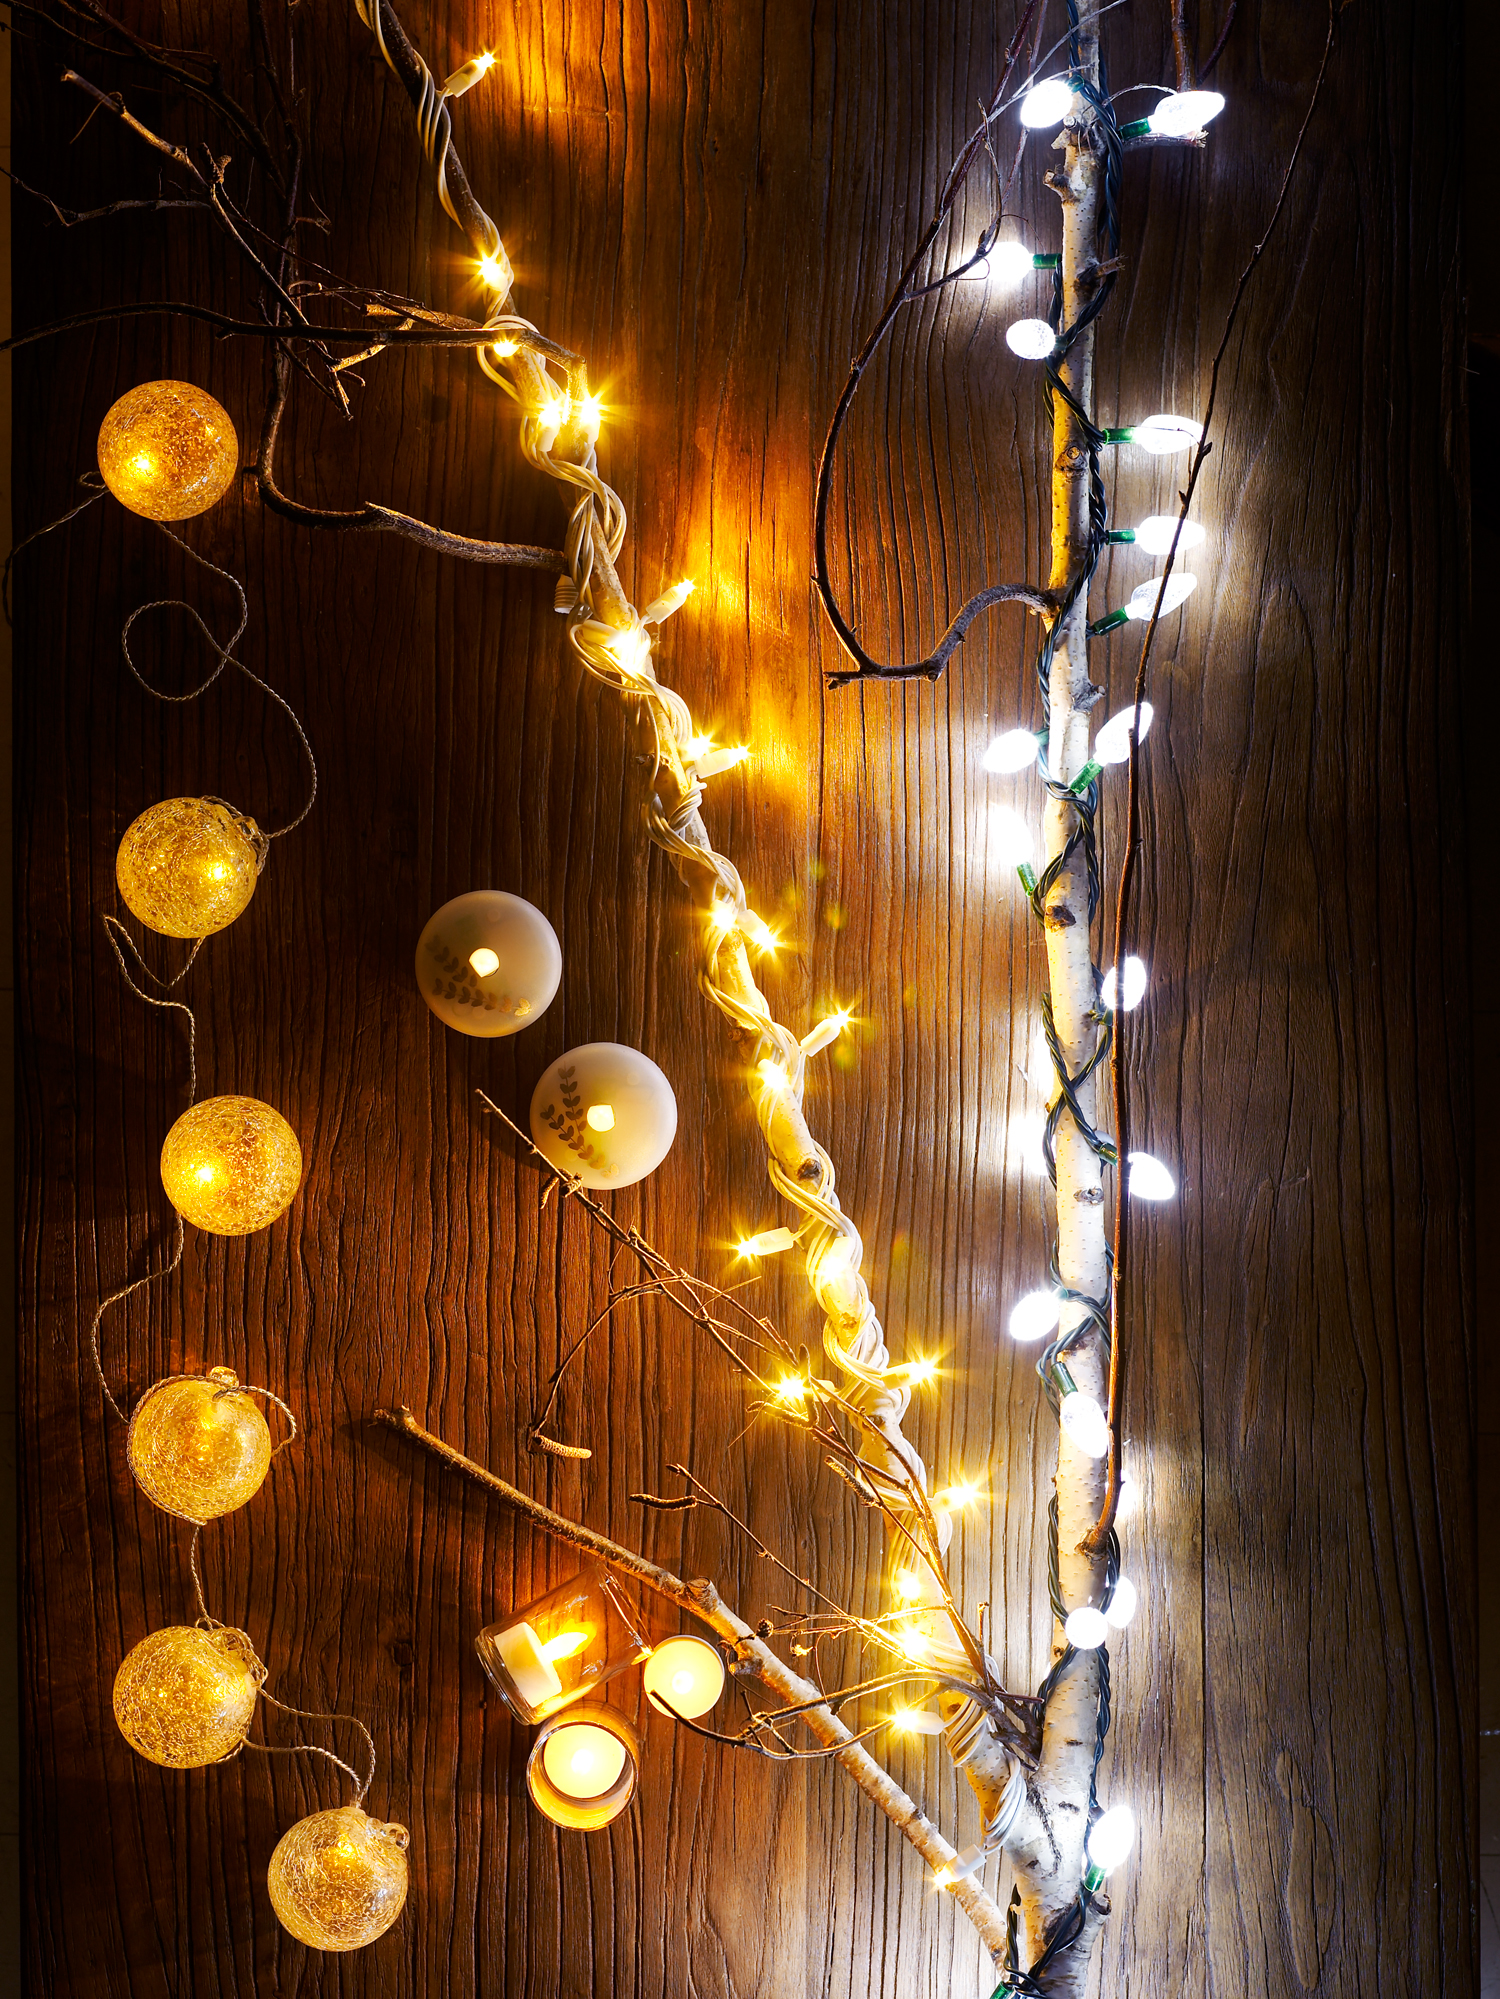 Led Christmas Lights Flicker